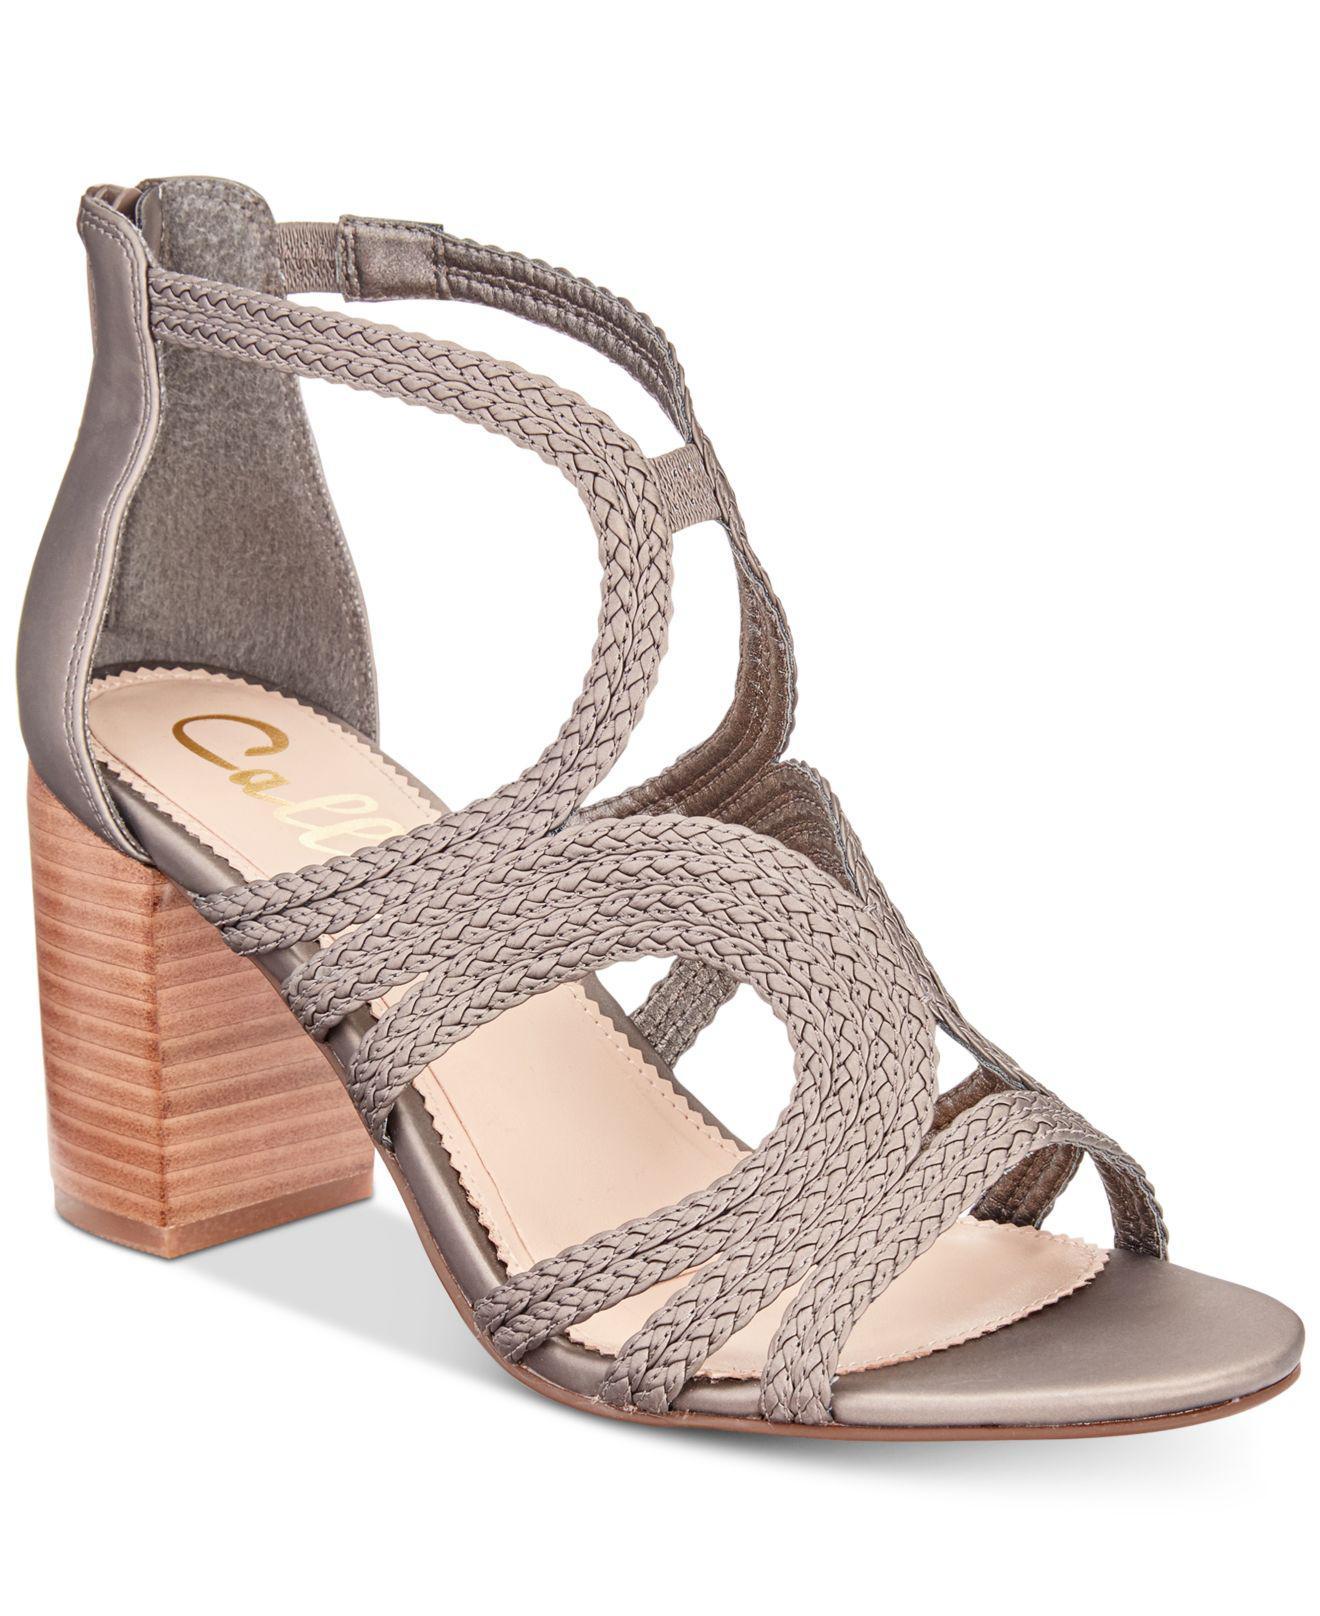 Callisto Shindig Strappy Block-Heel Sandals Women's Shoes Ues6x7r